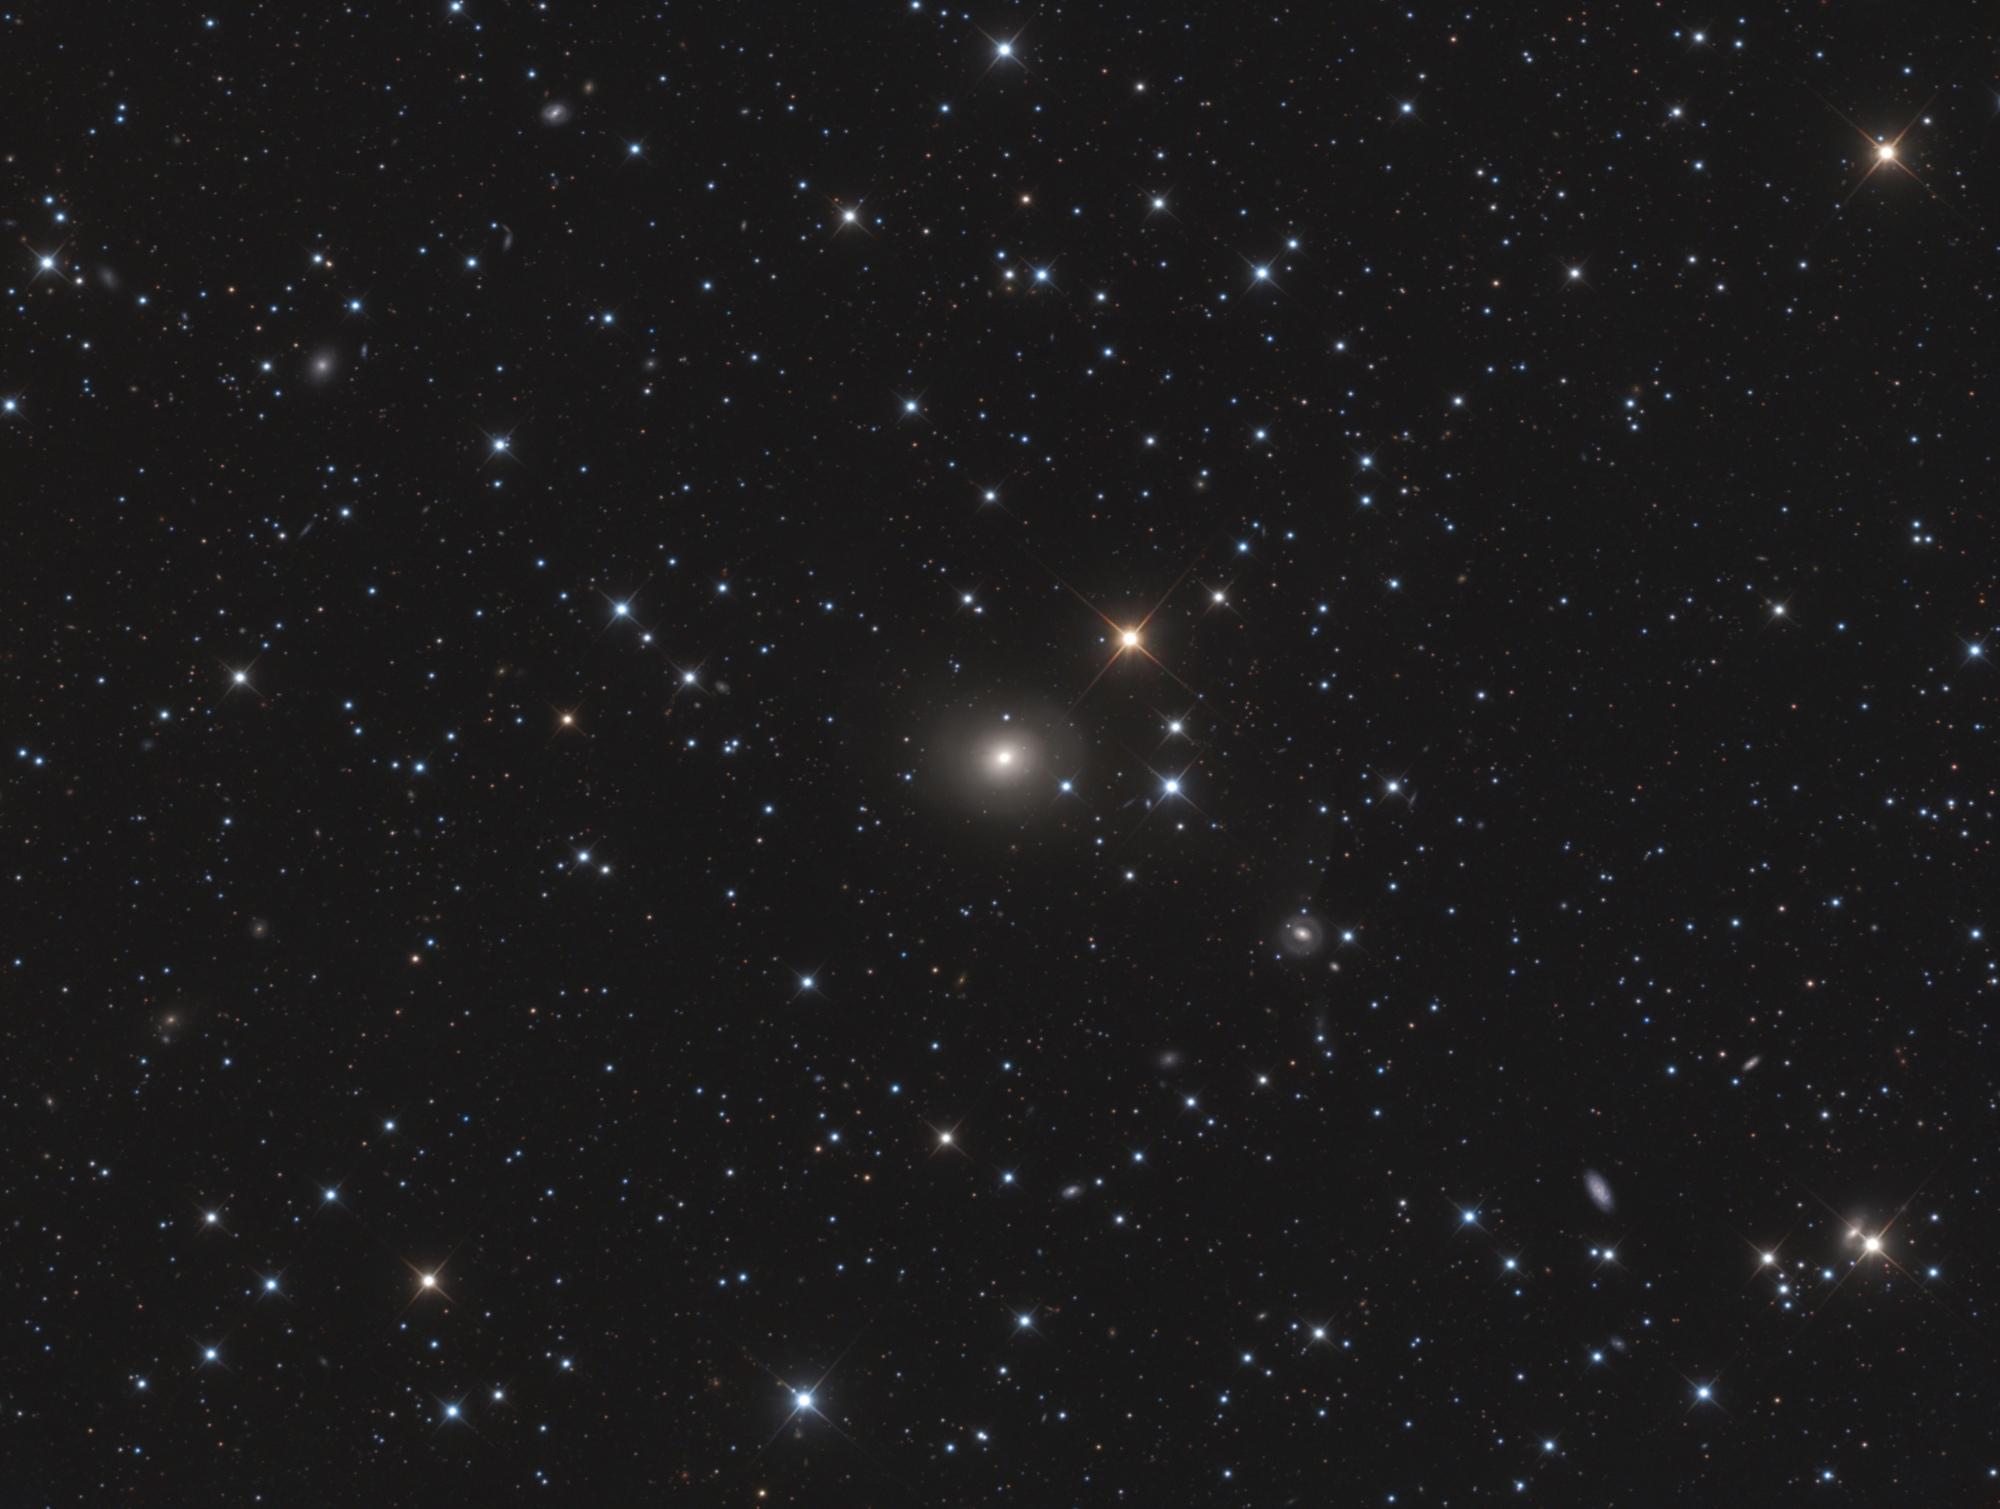 NGC6958-LRVB-V4.thumb.jpg.f195e6c6508b64d353c9b4711a8efa2f.jpg